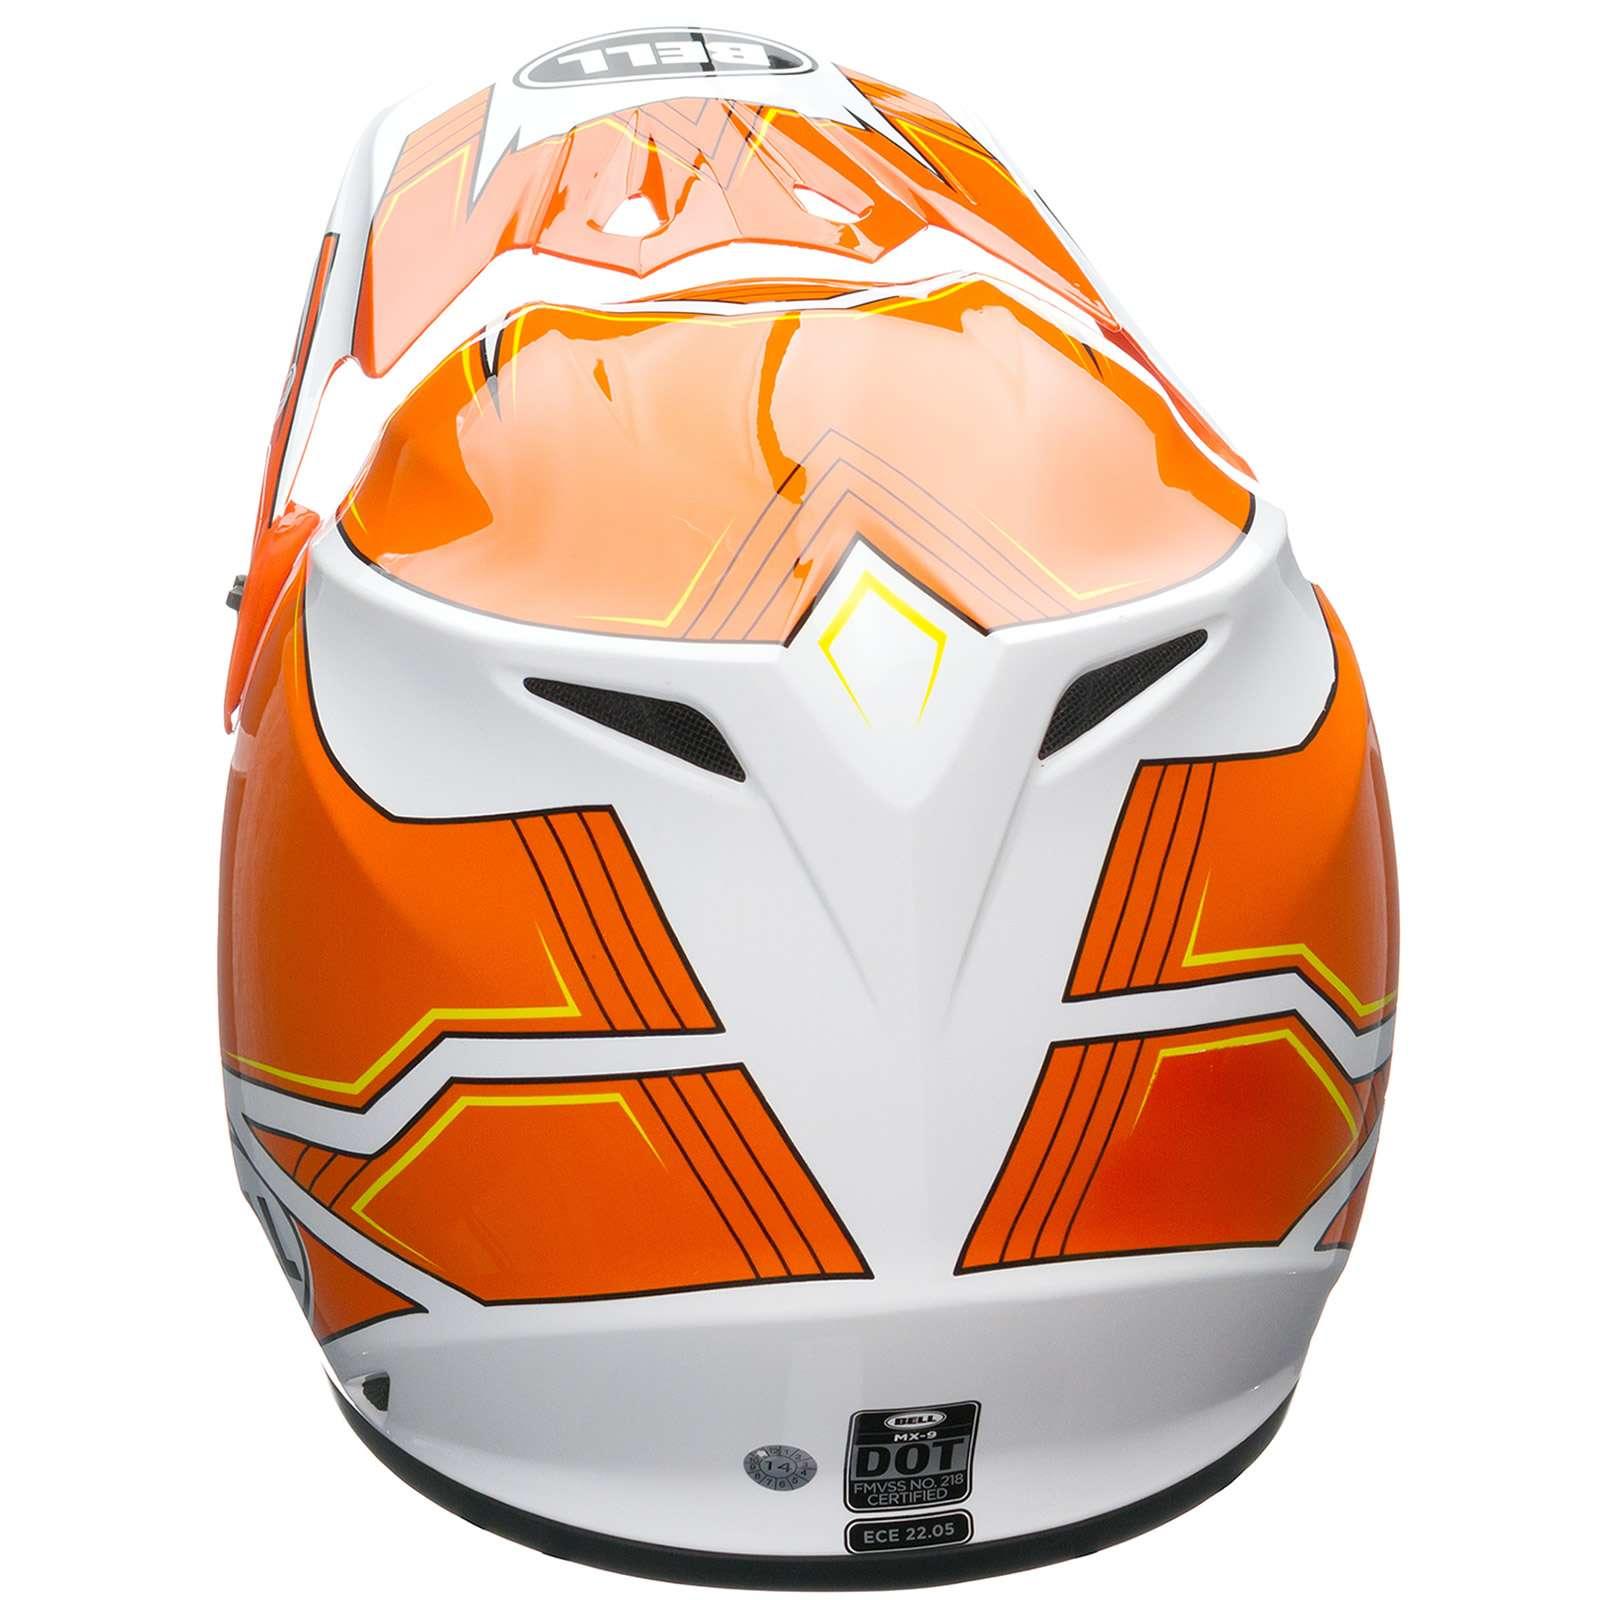 Details about Bell MX-9 MX9 Motocross MX BMX Enduro Full Face Helmet -  Blockade Orange